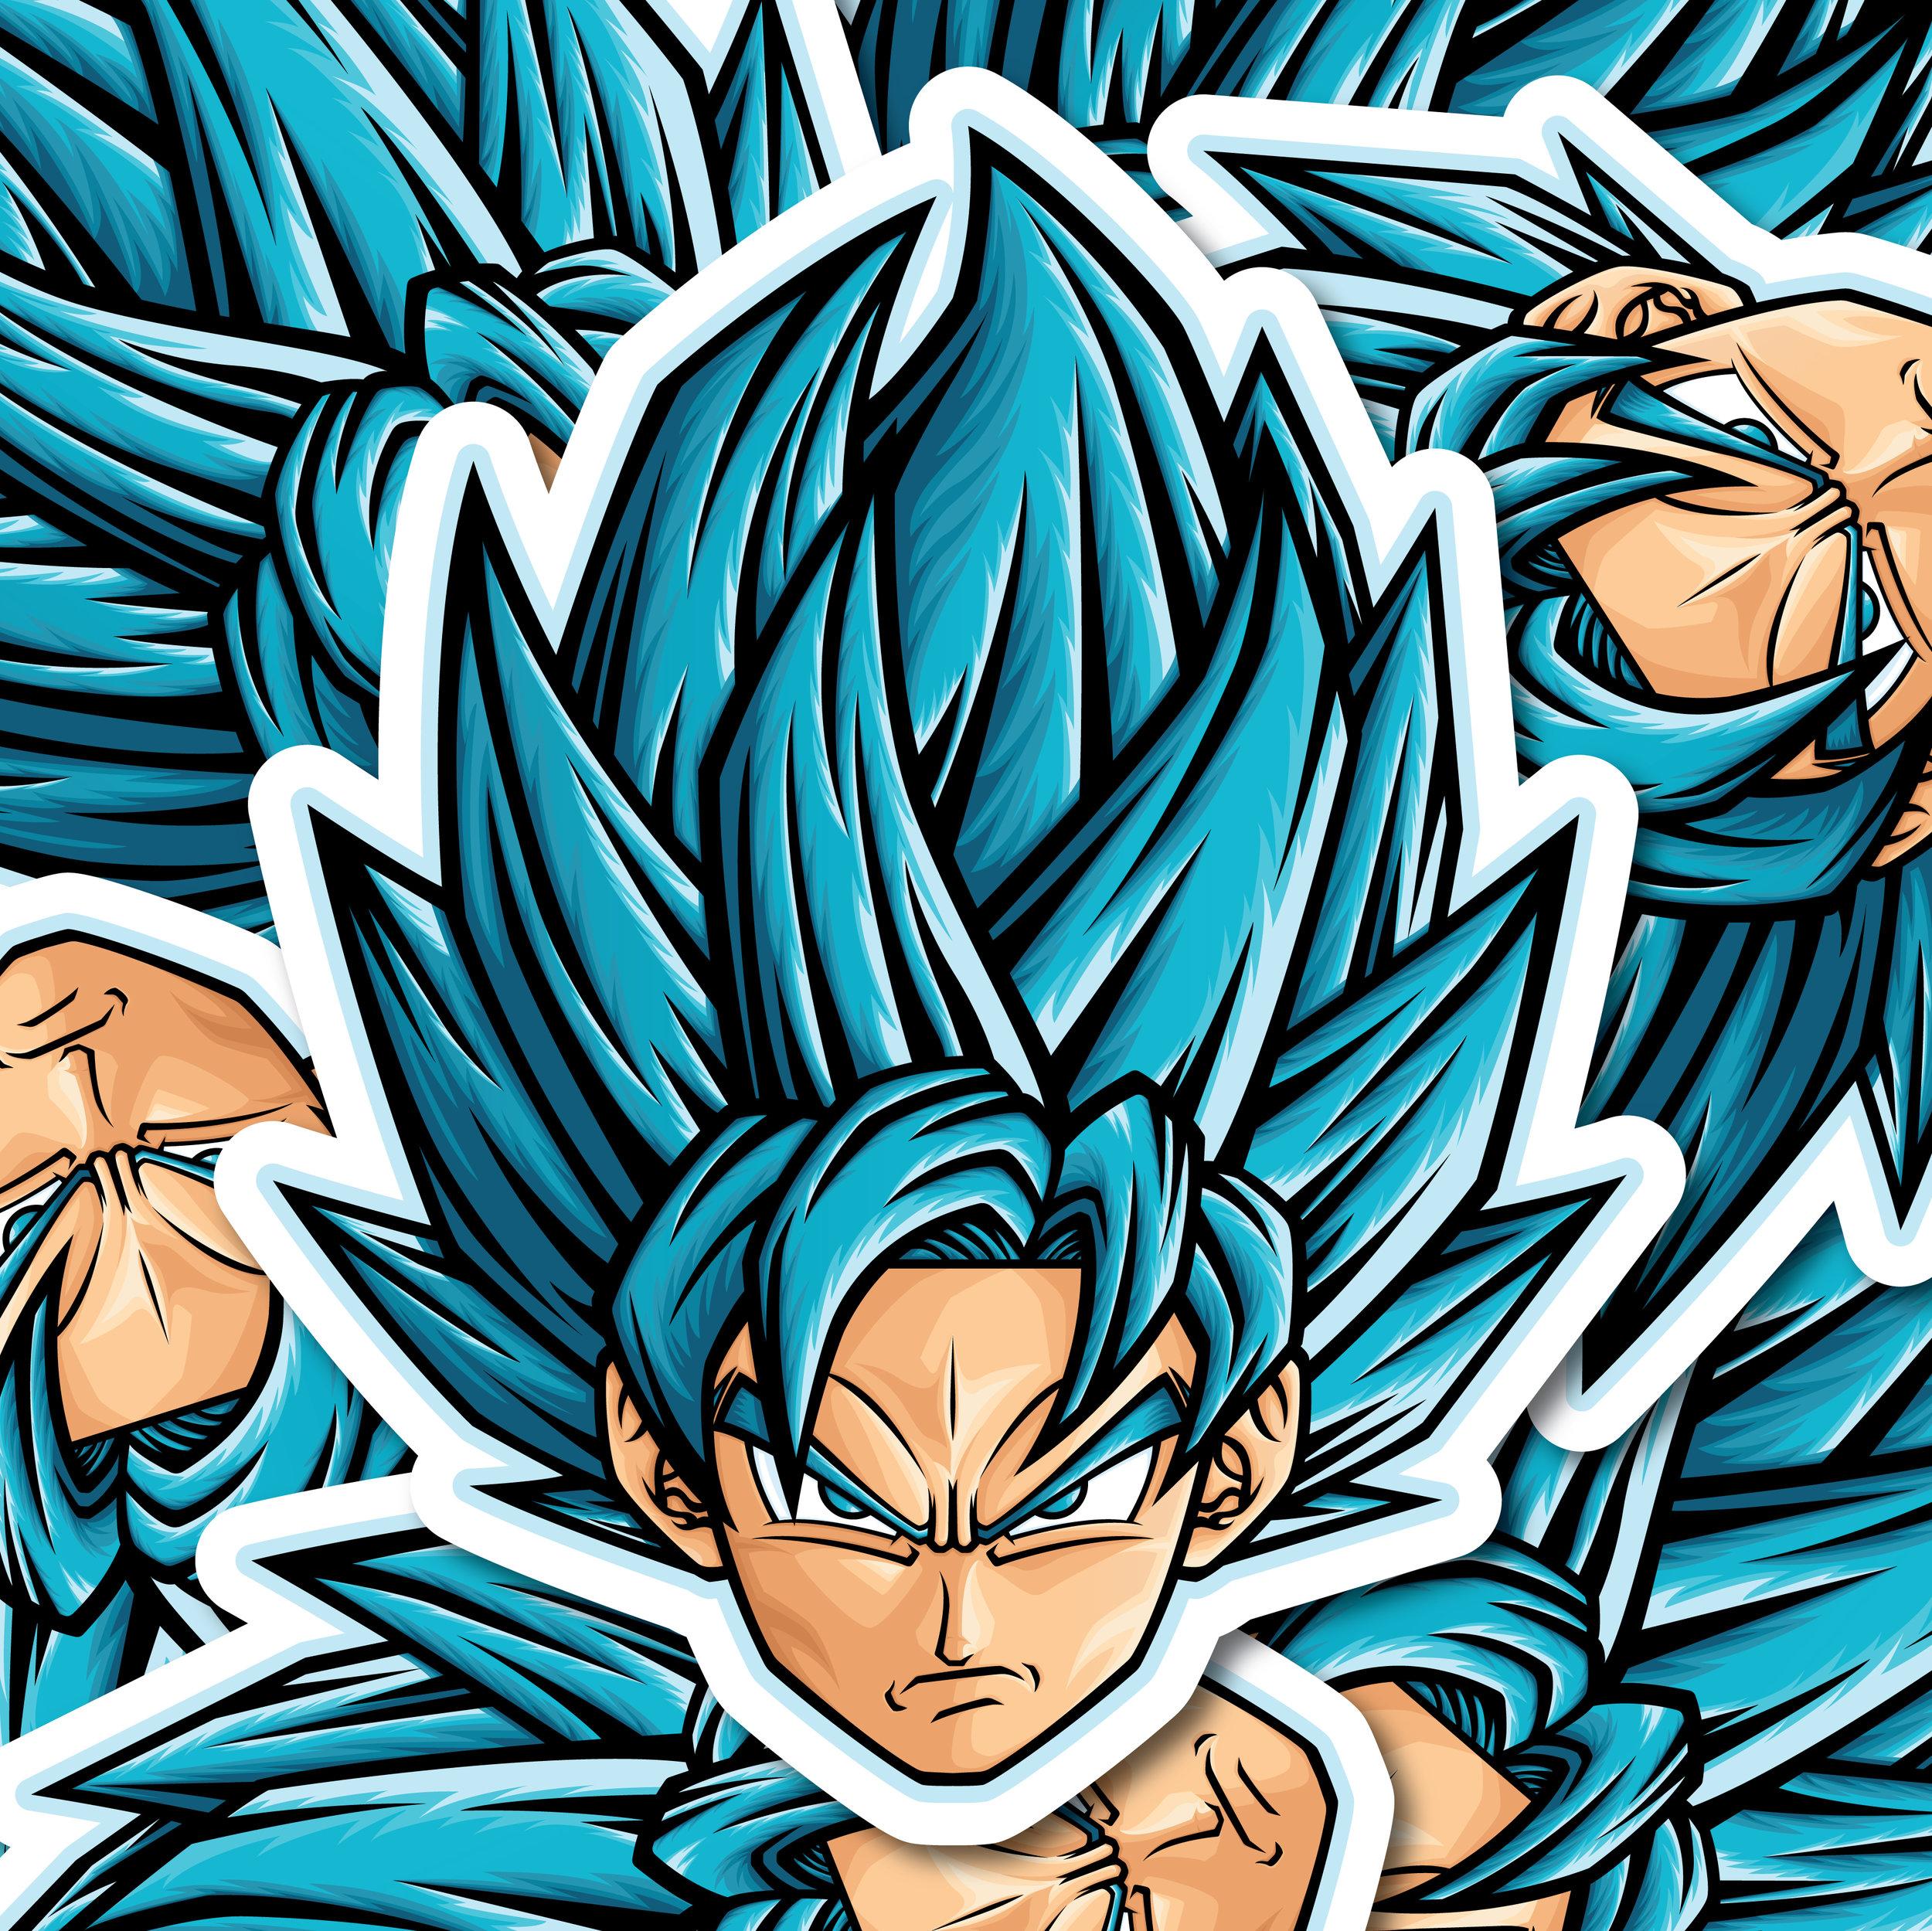 Goku-SSJB-Head-04.jpg